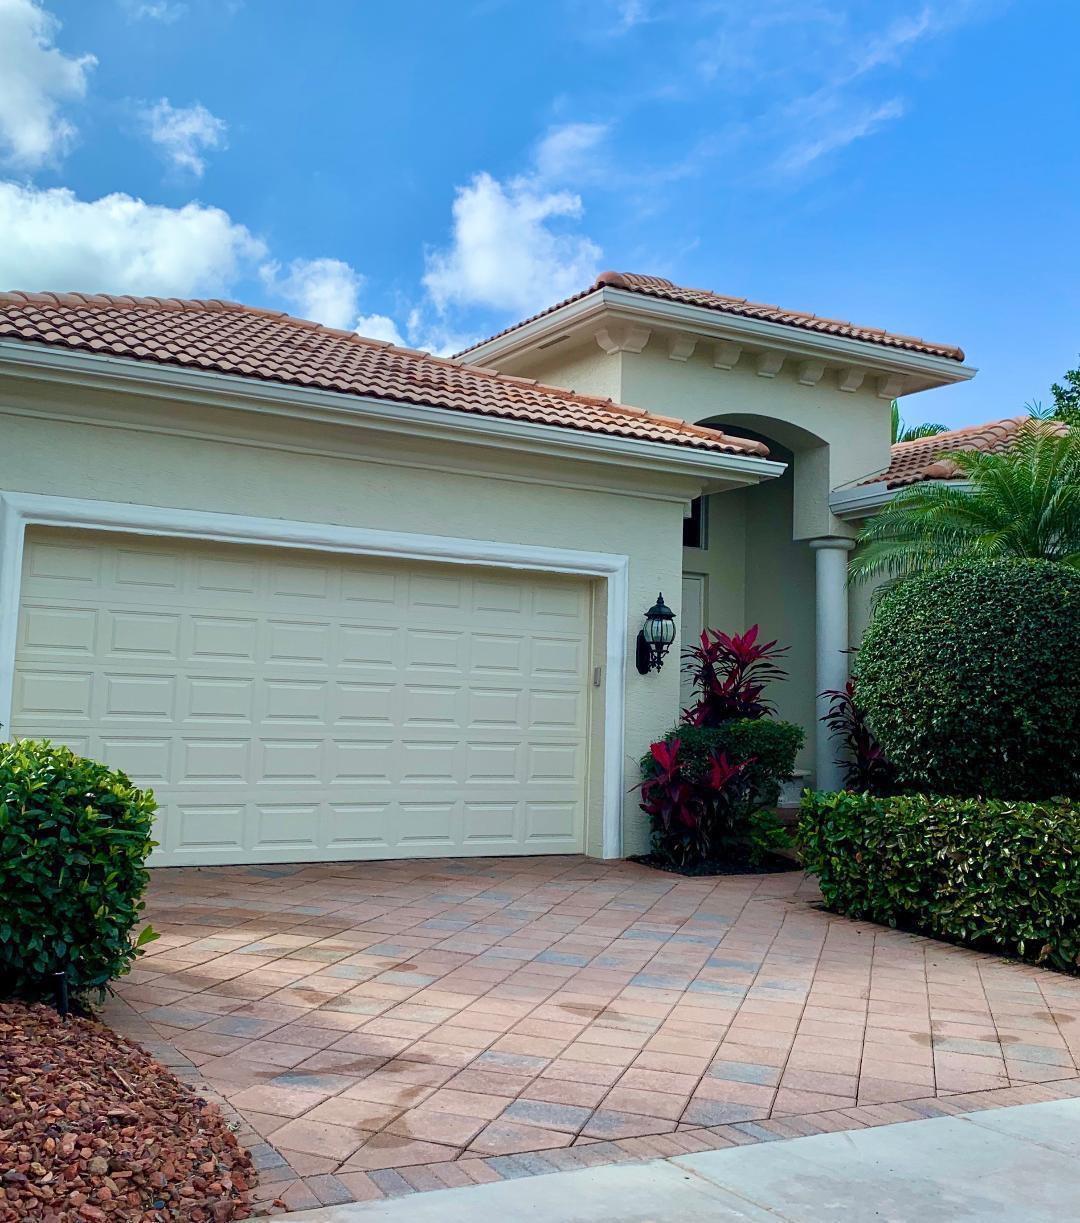 4098 Nw Briarcliff Circle Boca Raton, FL 33496